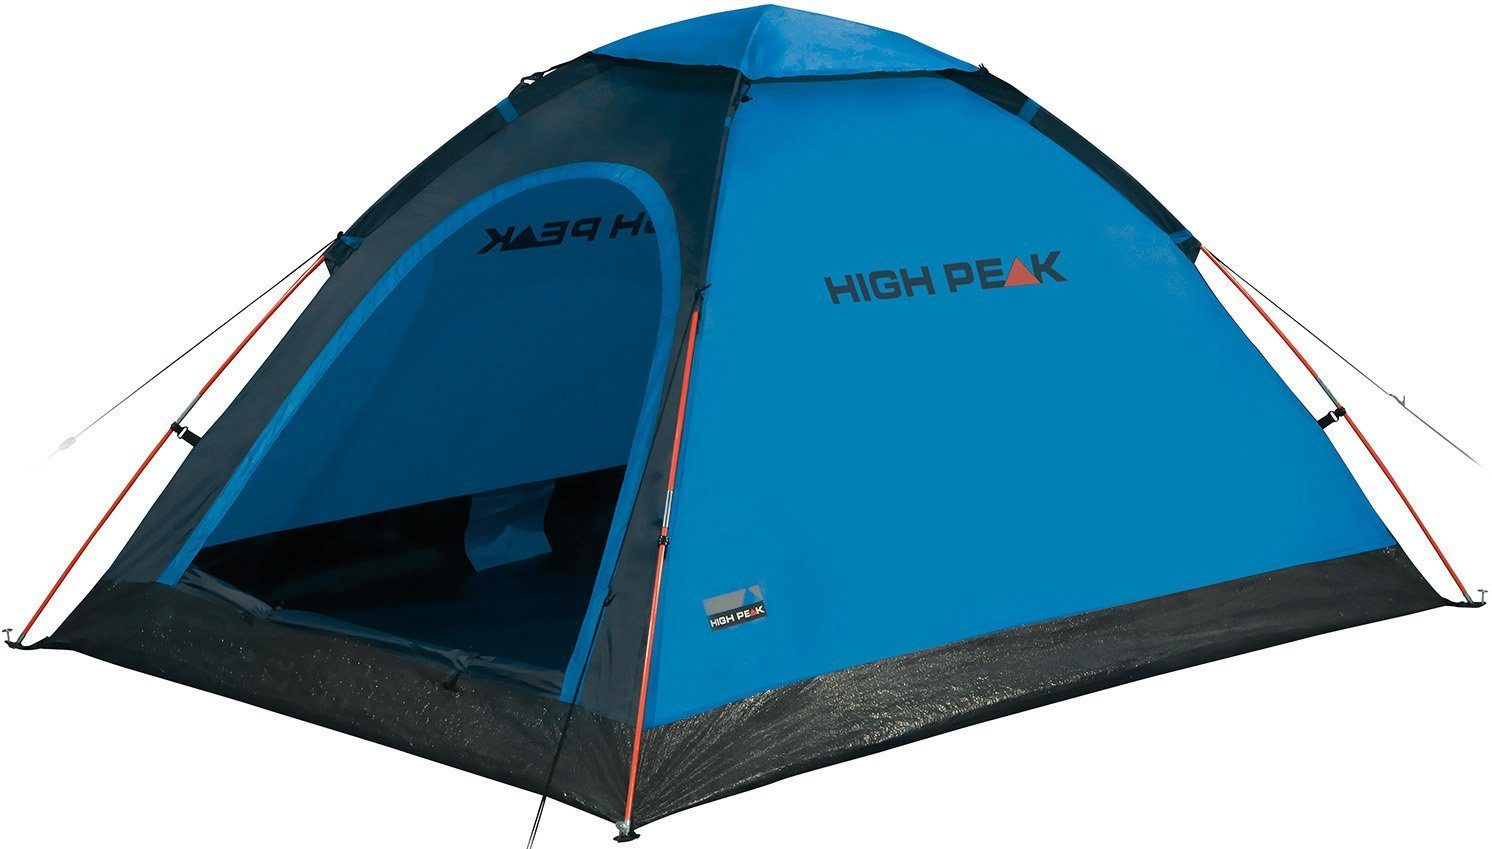 High Peak Kuppelzelt »Monodome«, 2 Personen (Set, mit Transporttasche)